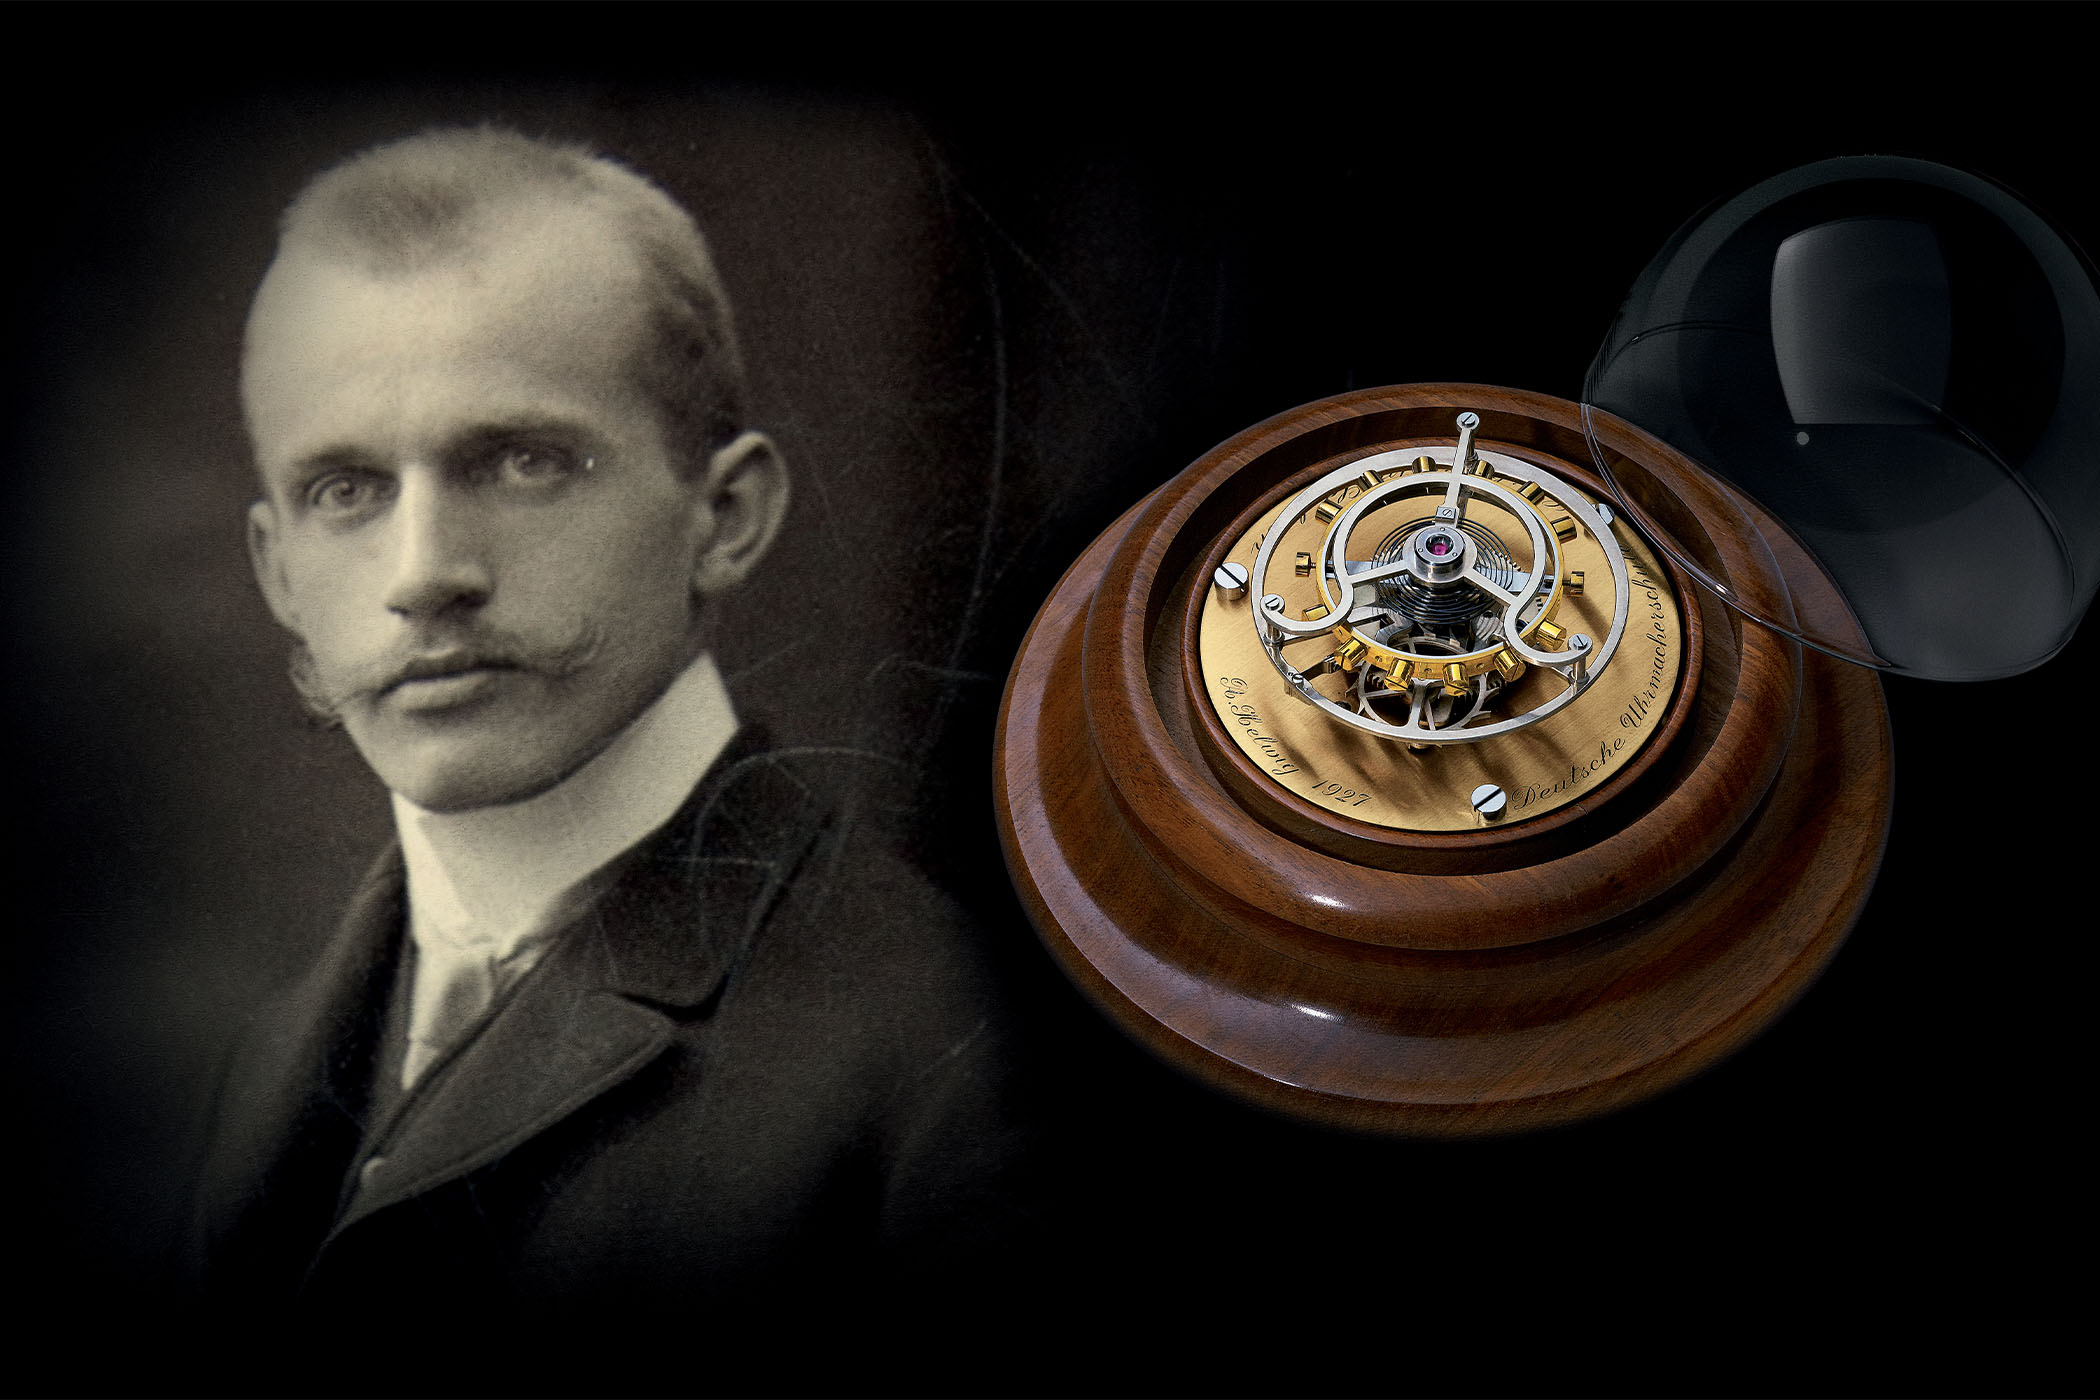 Glashutte Original Alfred Helwig Tourbillon 1920 - Limited Edition